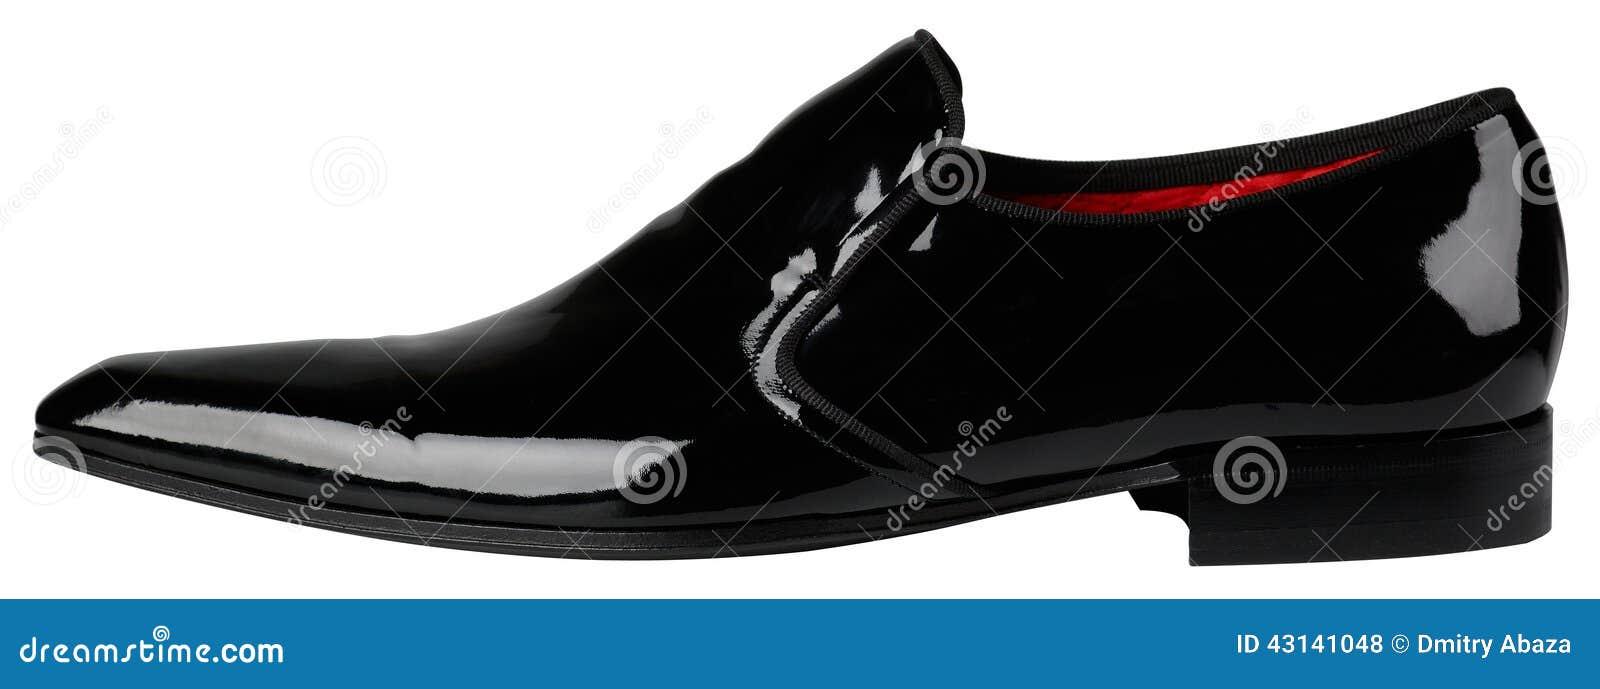 4d7e9b2669a9a Zapatos Clásicos Para Hombre Negros Foto de archivo - Imagen de ...